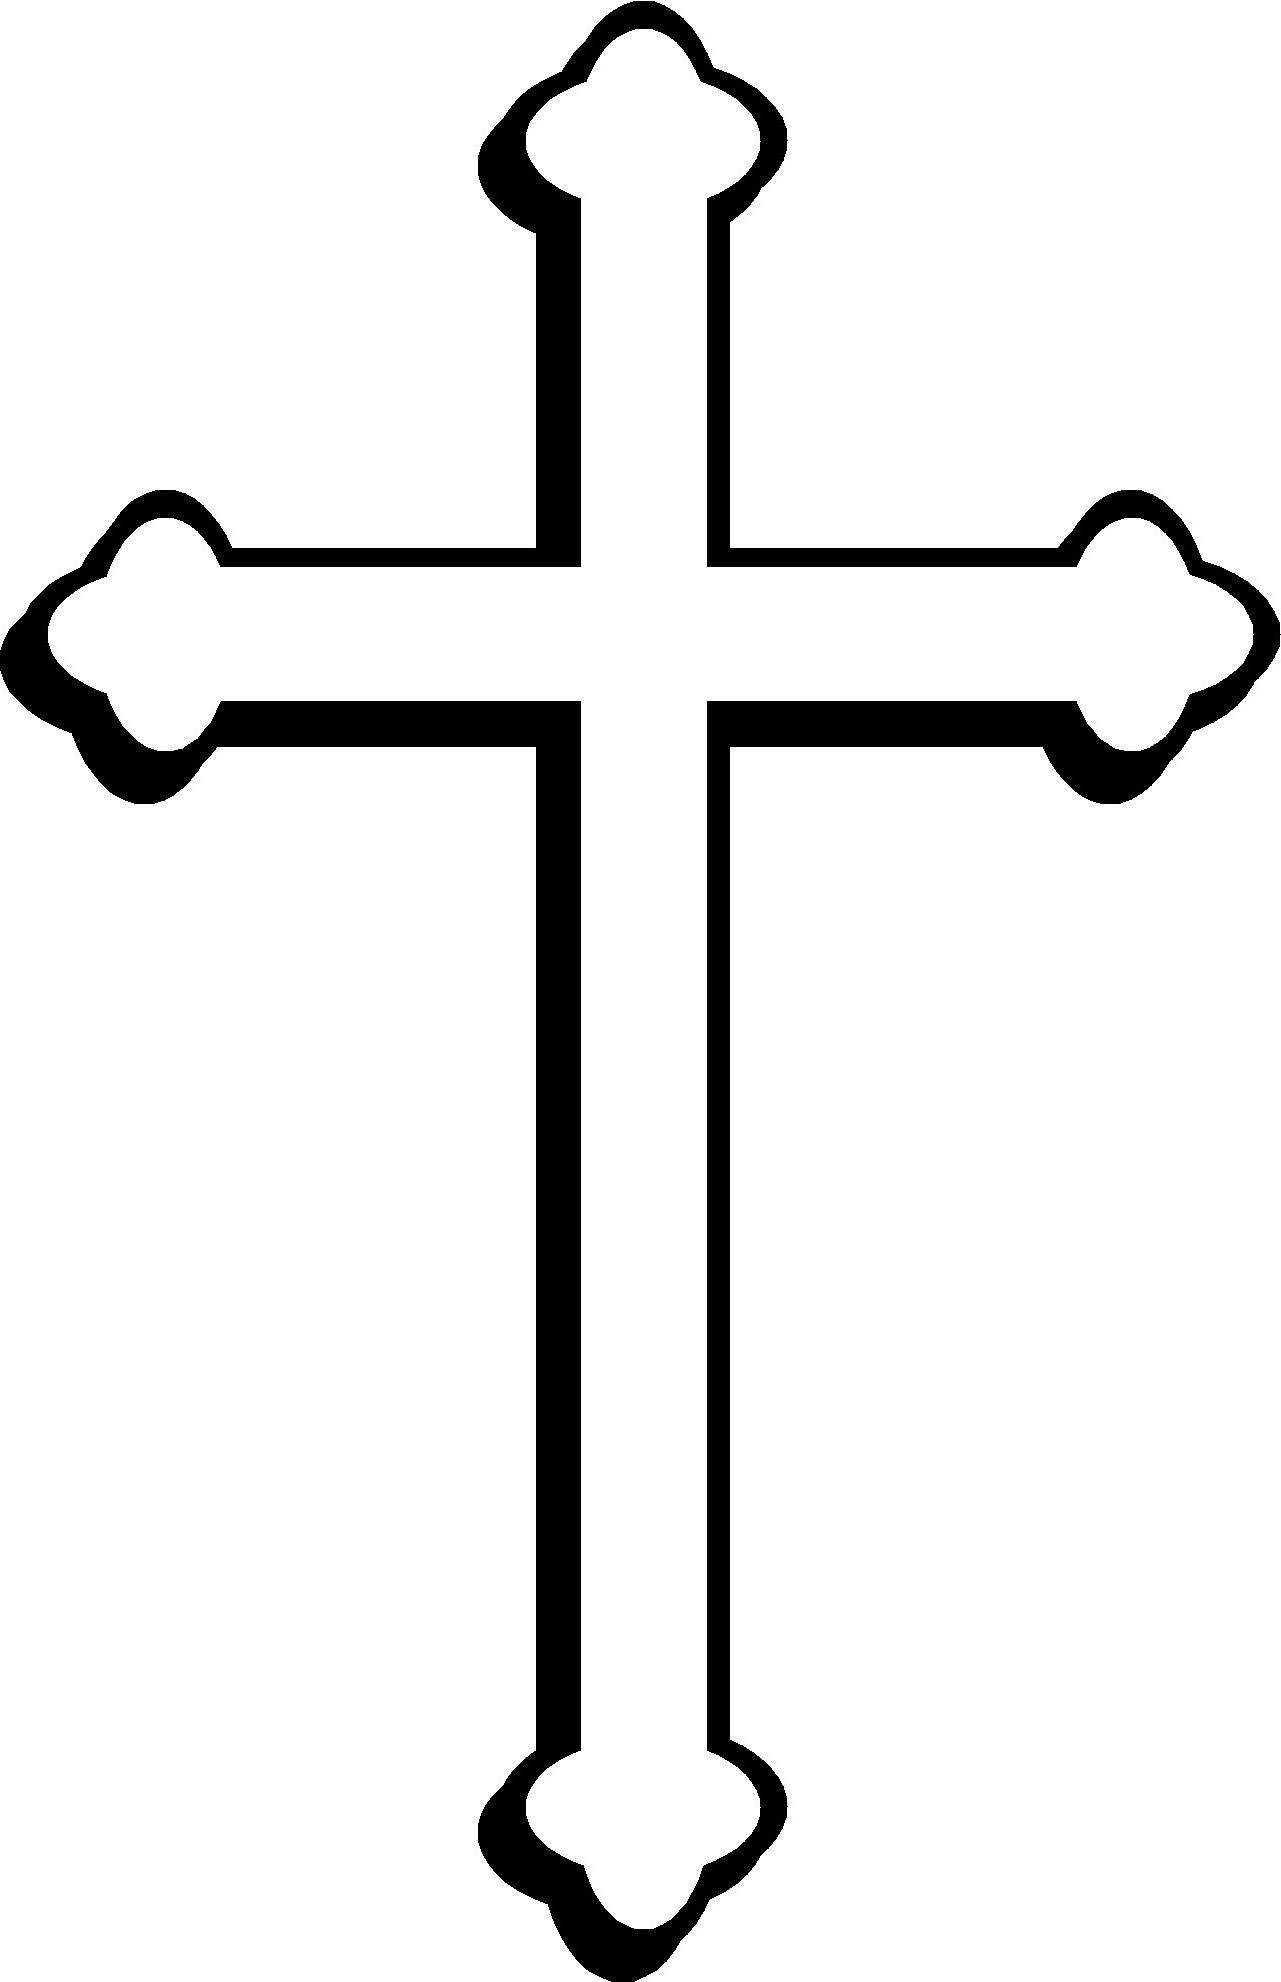 Catholic crucifix clipart clip art royalty free stock Catholic Cross Clipart | Free download best Catholic Cross Clipart ... clip art royalty free stock